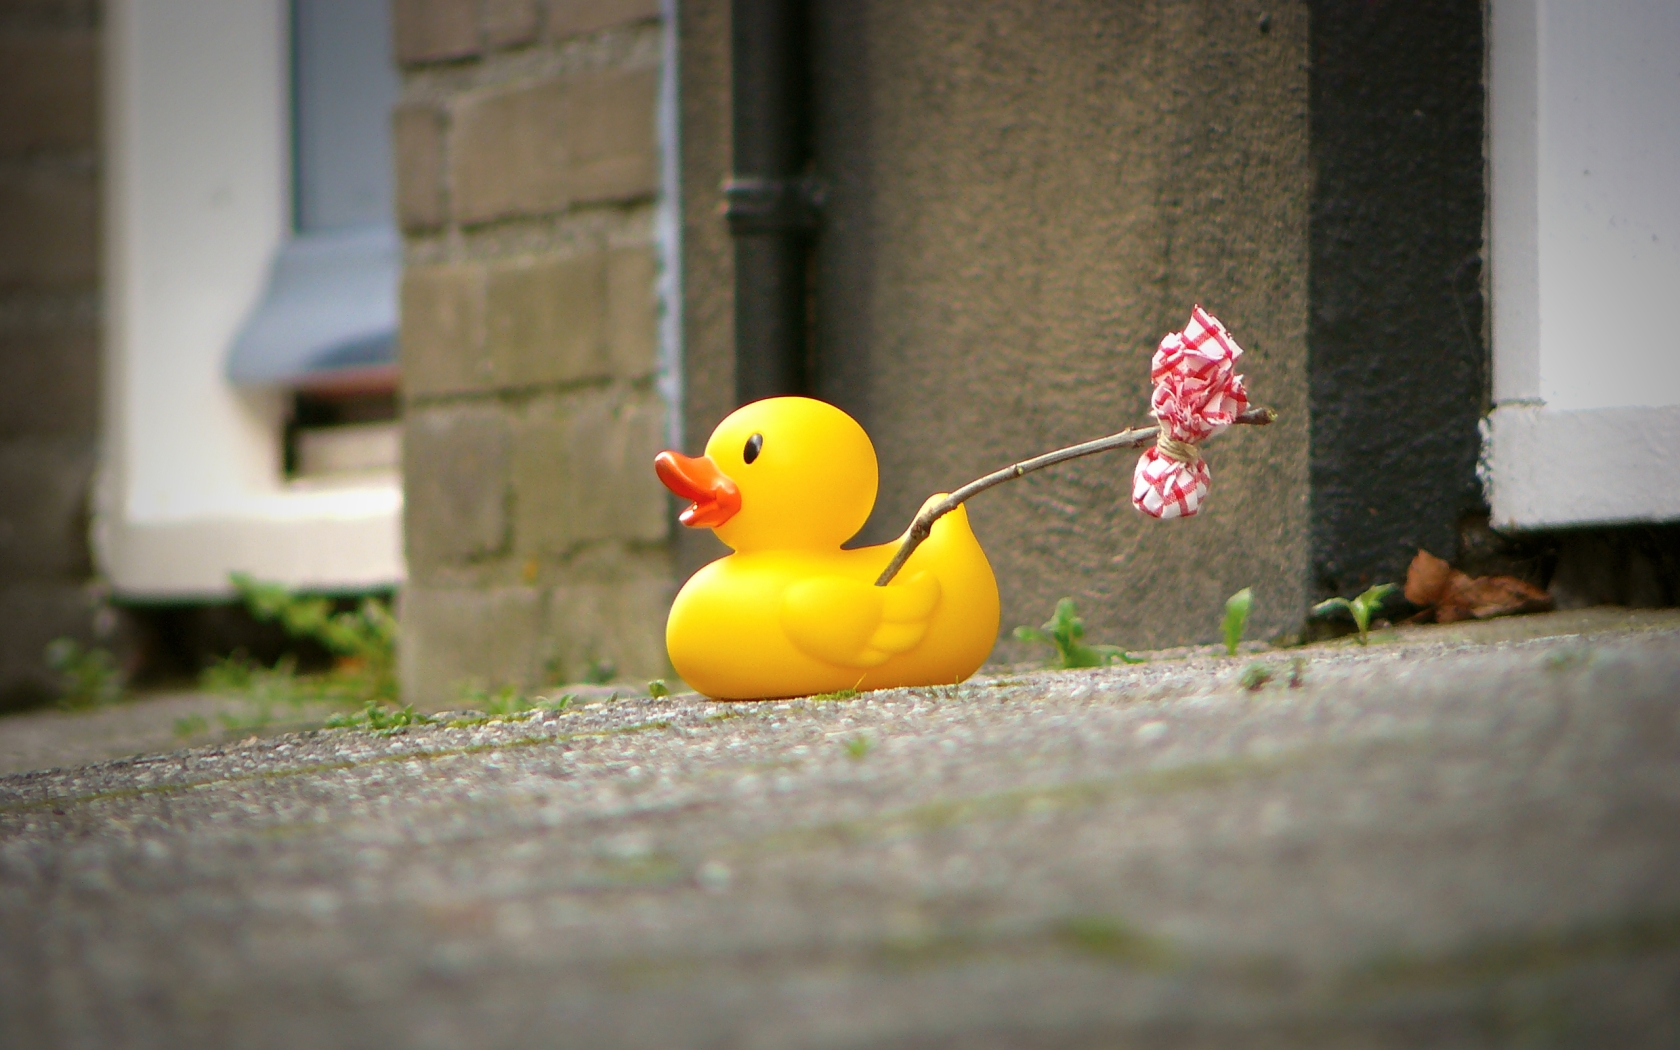 48 Rubber Duck Wallpaper On Wallpapersafari